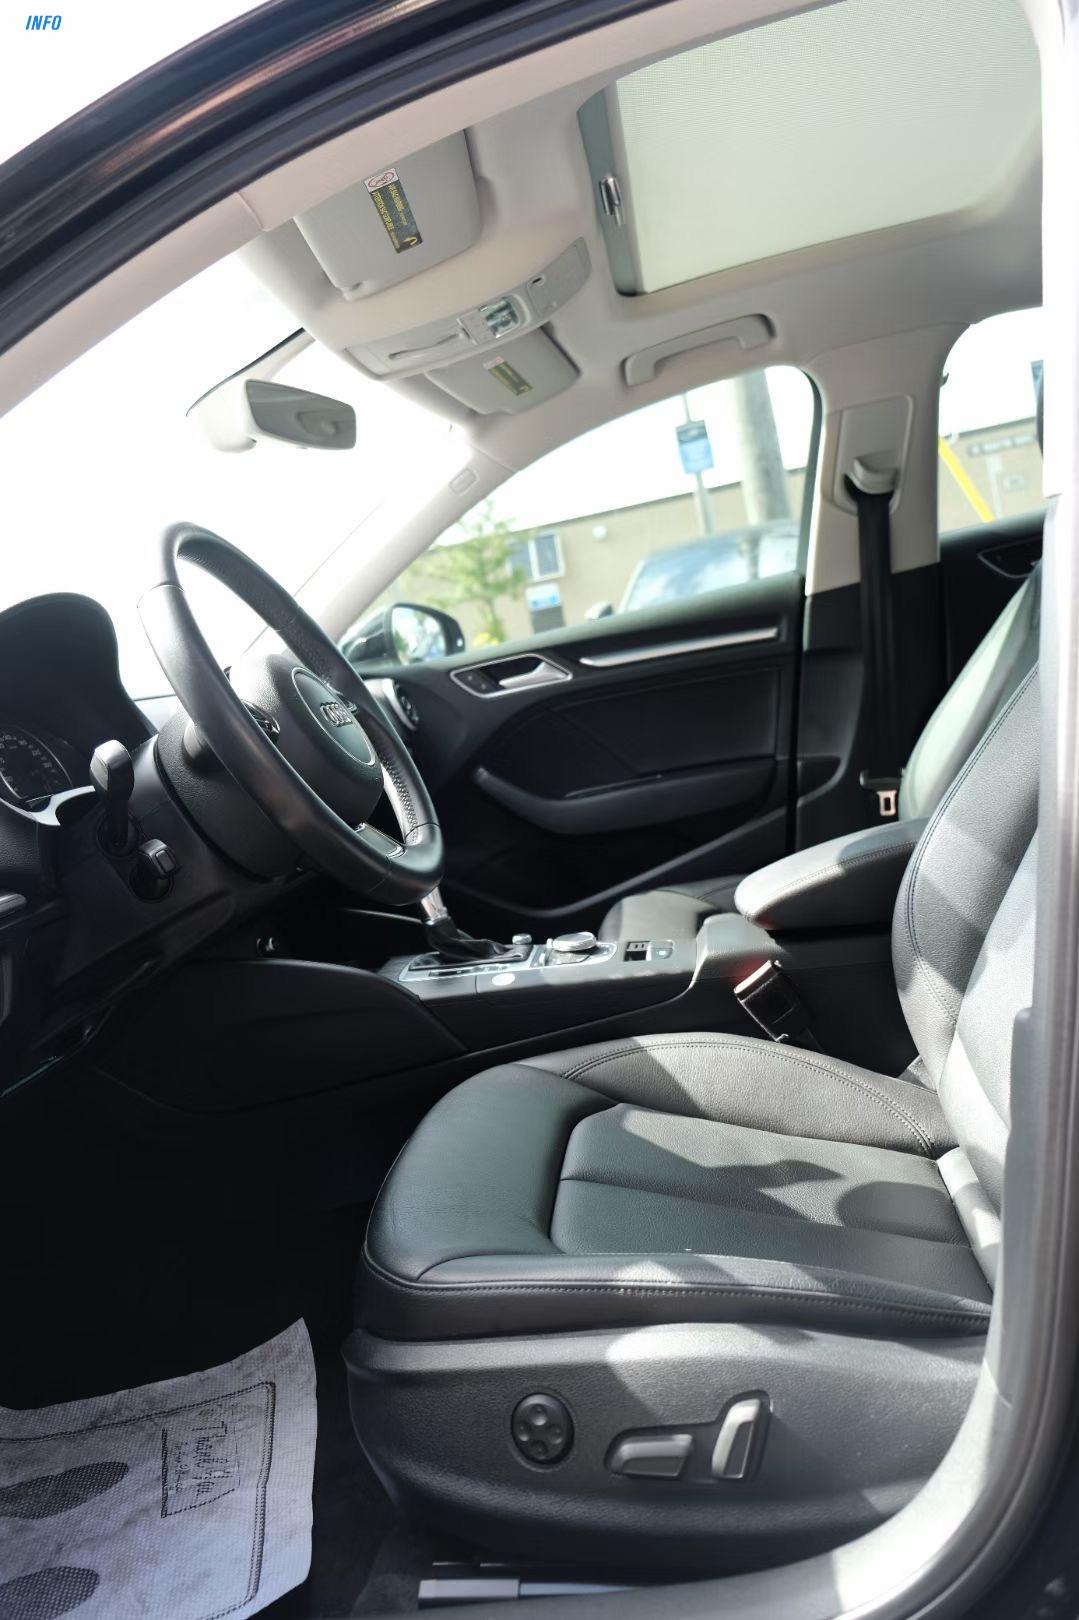 2016 Audi A3 progressive - INFOCAR - Toronto's Most Comprehensive New and Used Auto Trading Platform